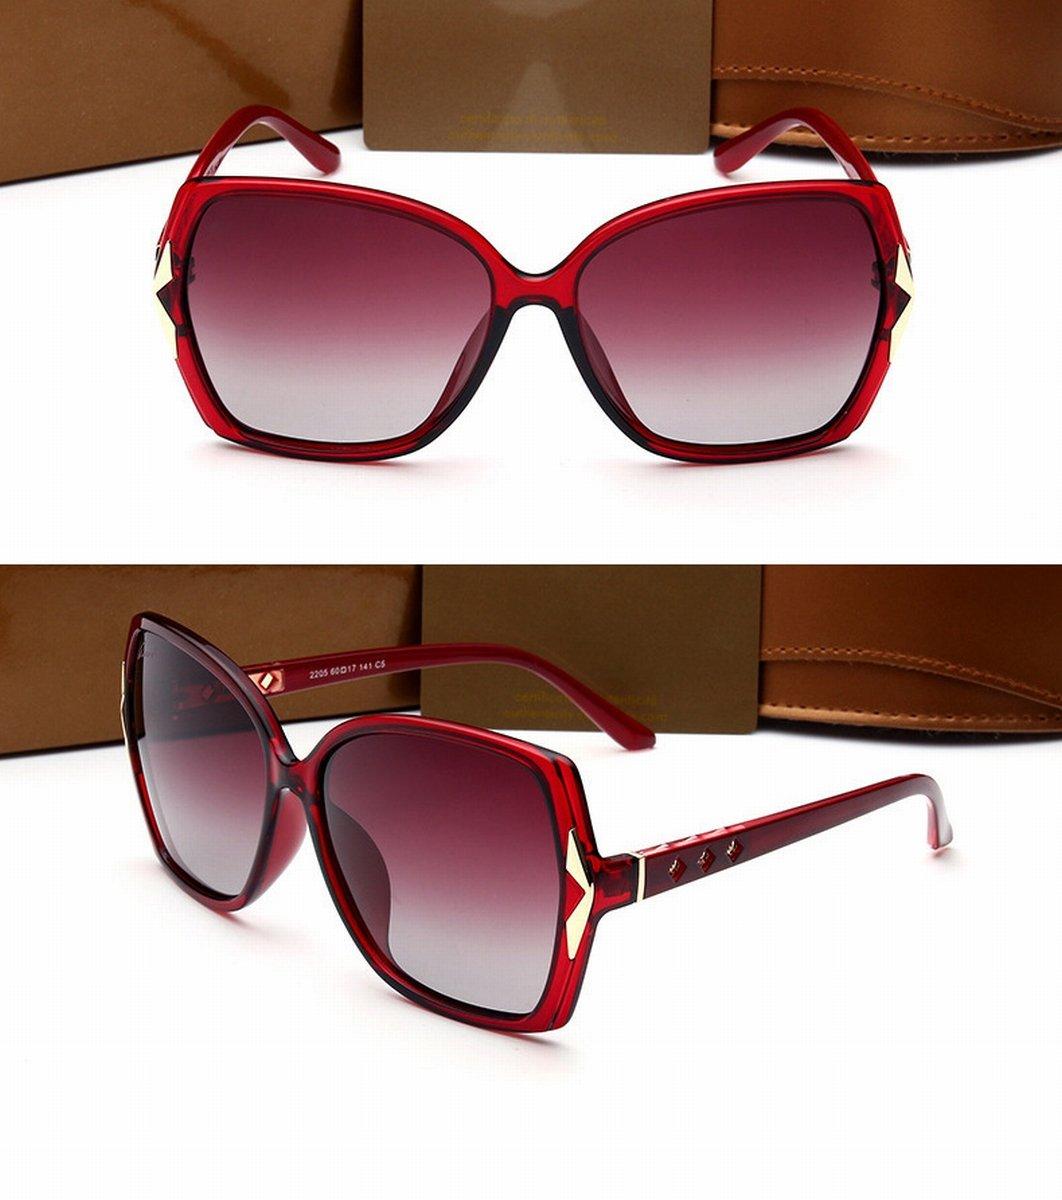 Big Frame Frau Brille Großes Gesicht Polarisierte Farbe Sonnenbrille ...